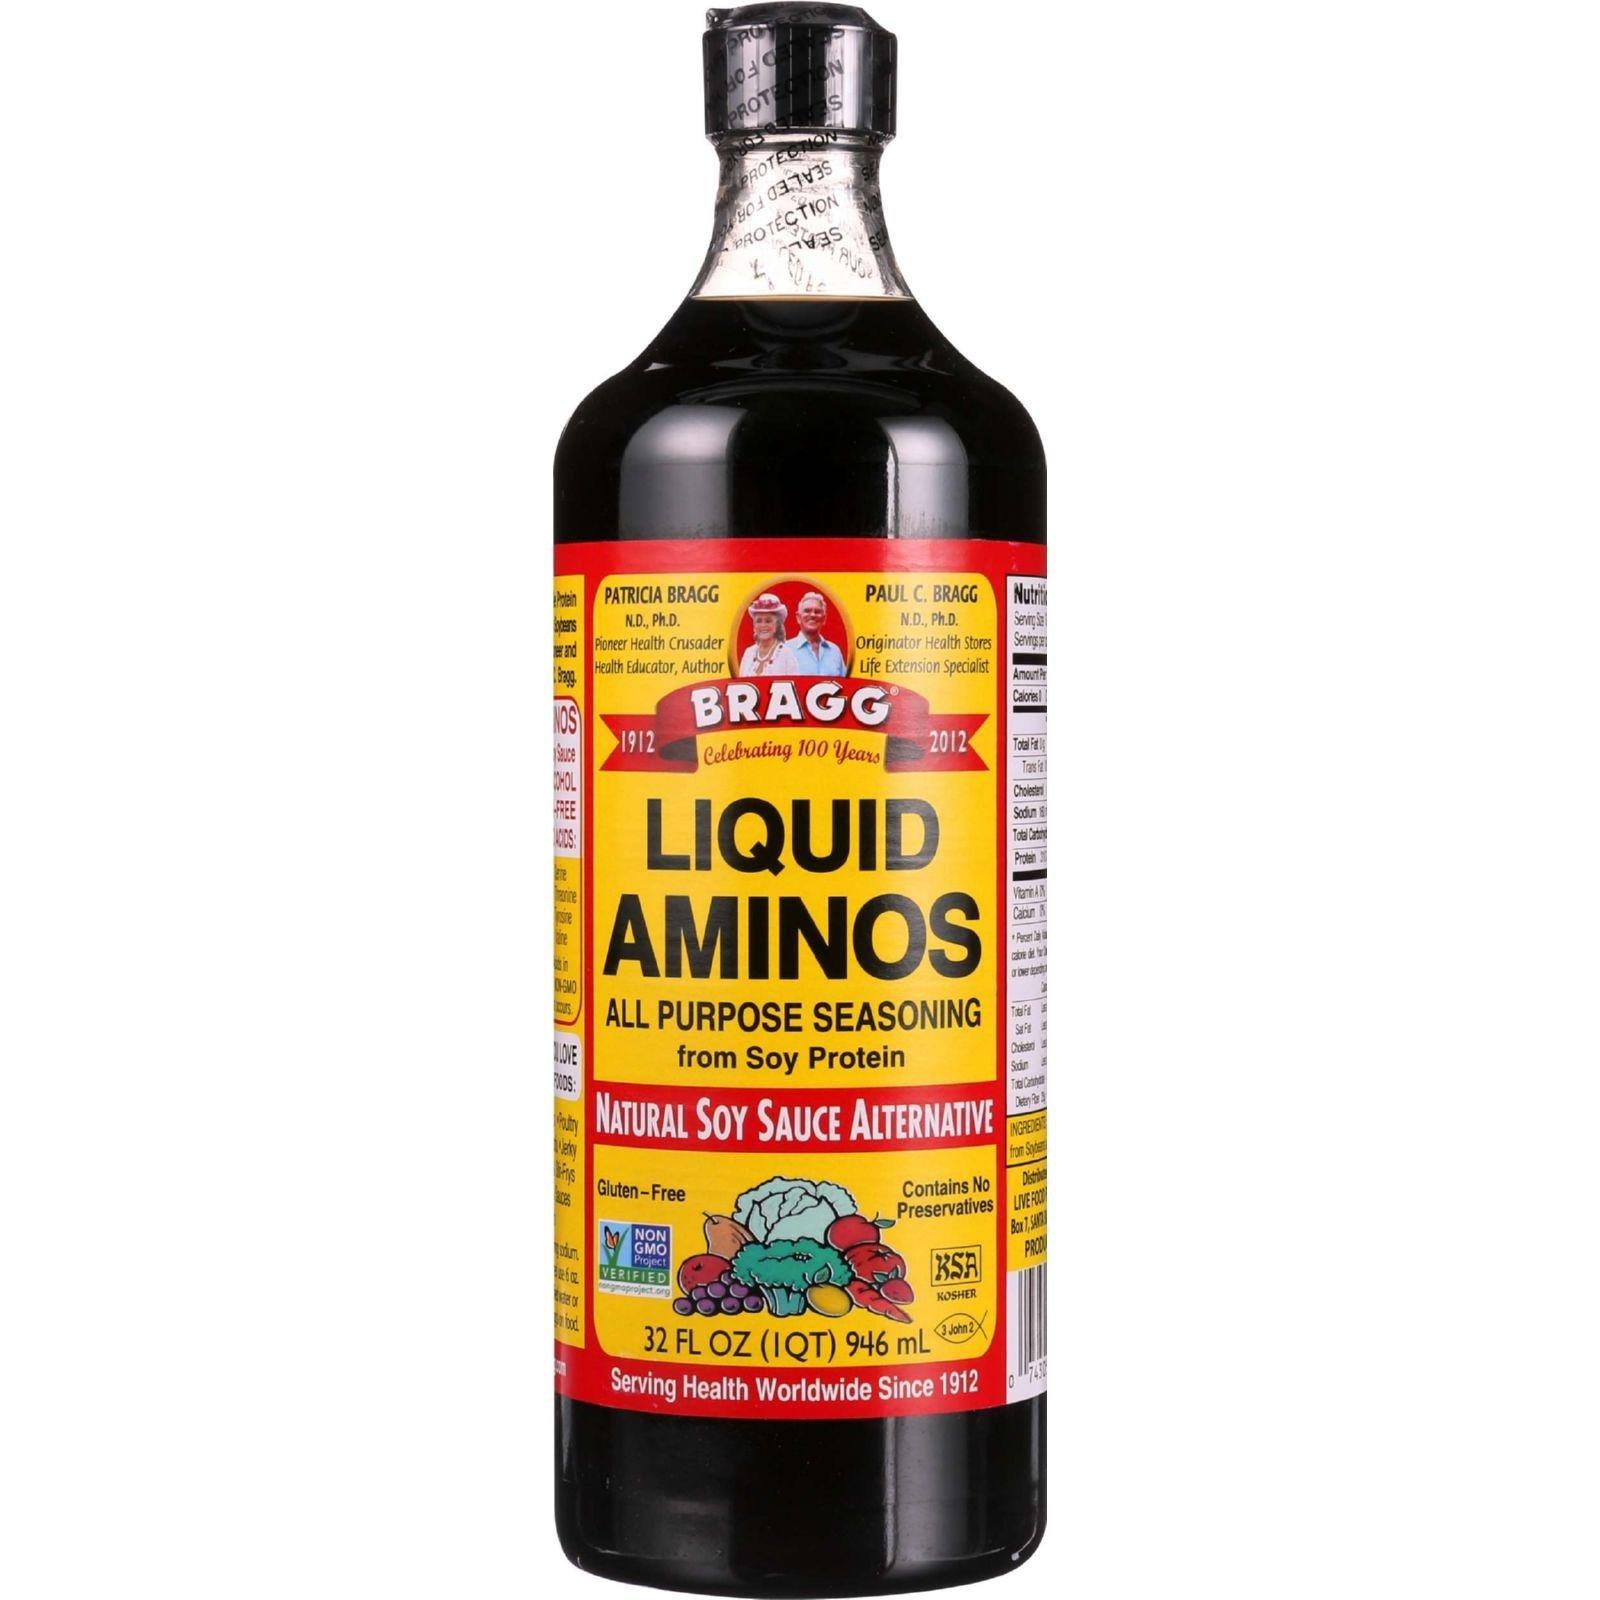 Bragg Liquid Aminos - 32 oz - 1 each, Sports and Fitness, Amino Acids Kosher GMO Free